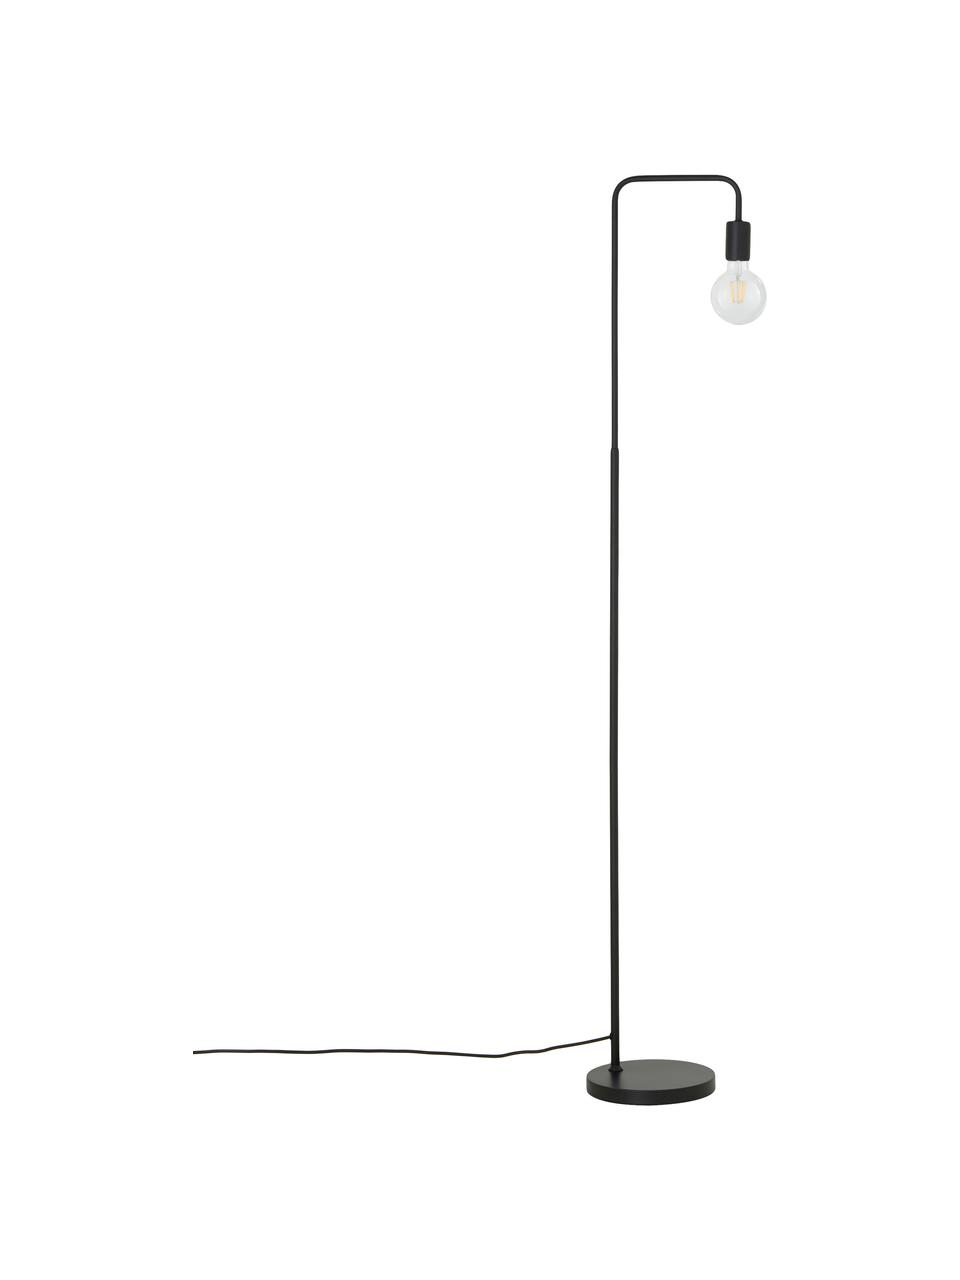 Lampada da lettura in metallo nero Flow, Nero, nero, Larg. 33 x Alt. 153 cm